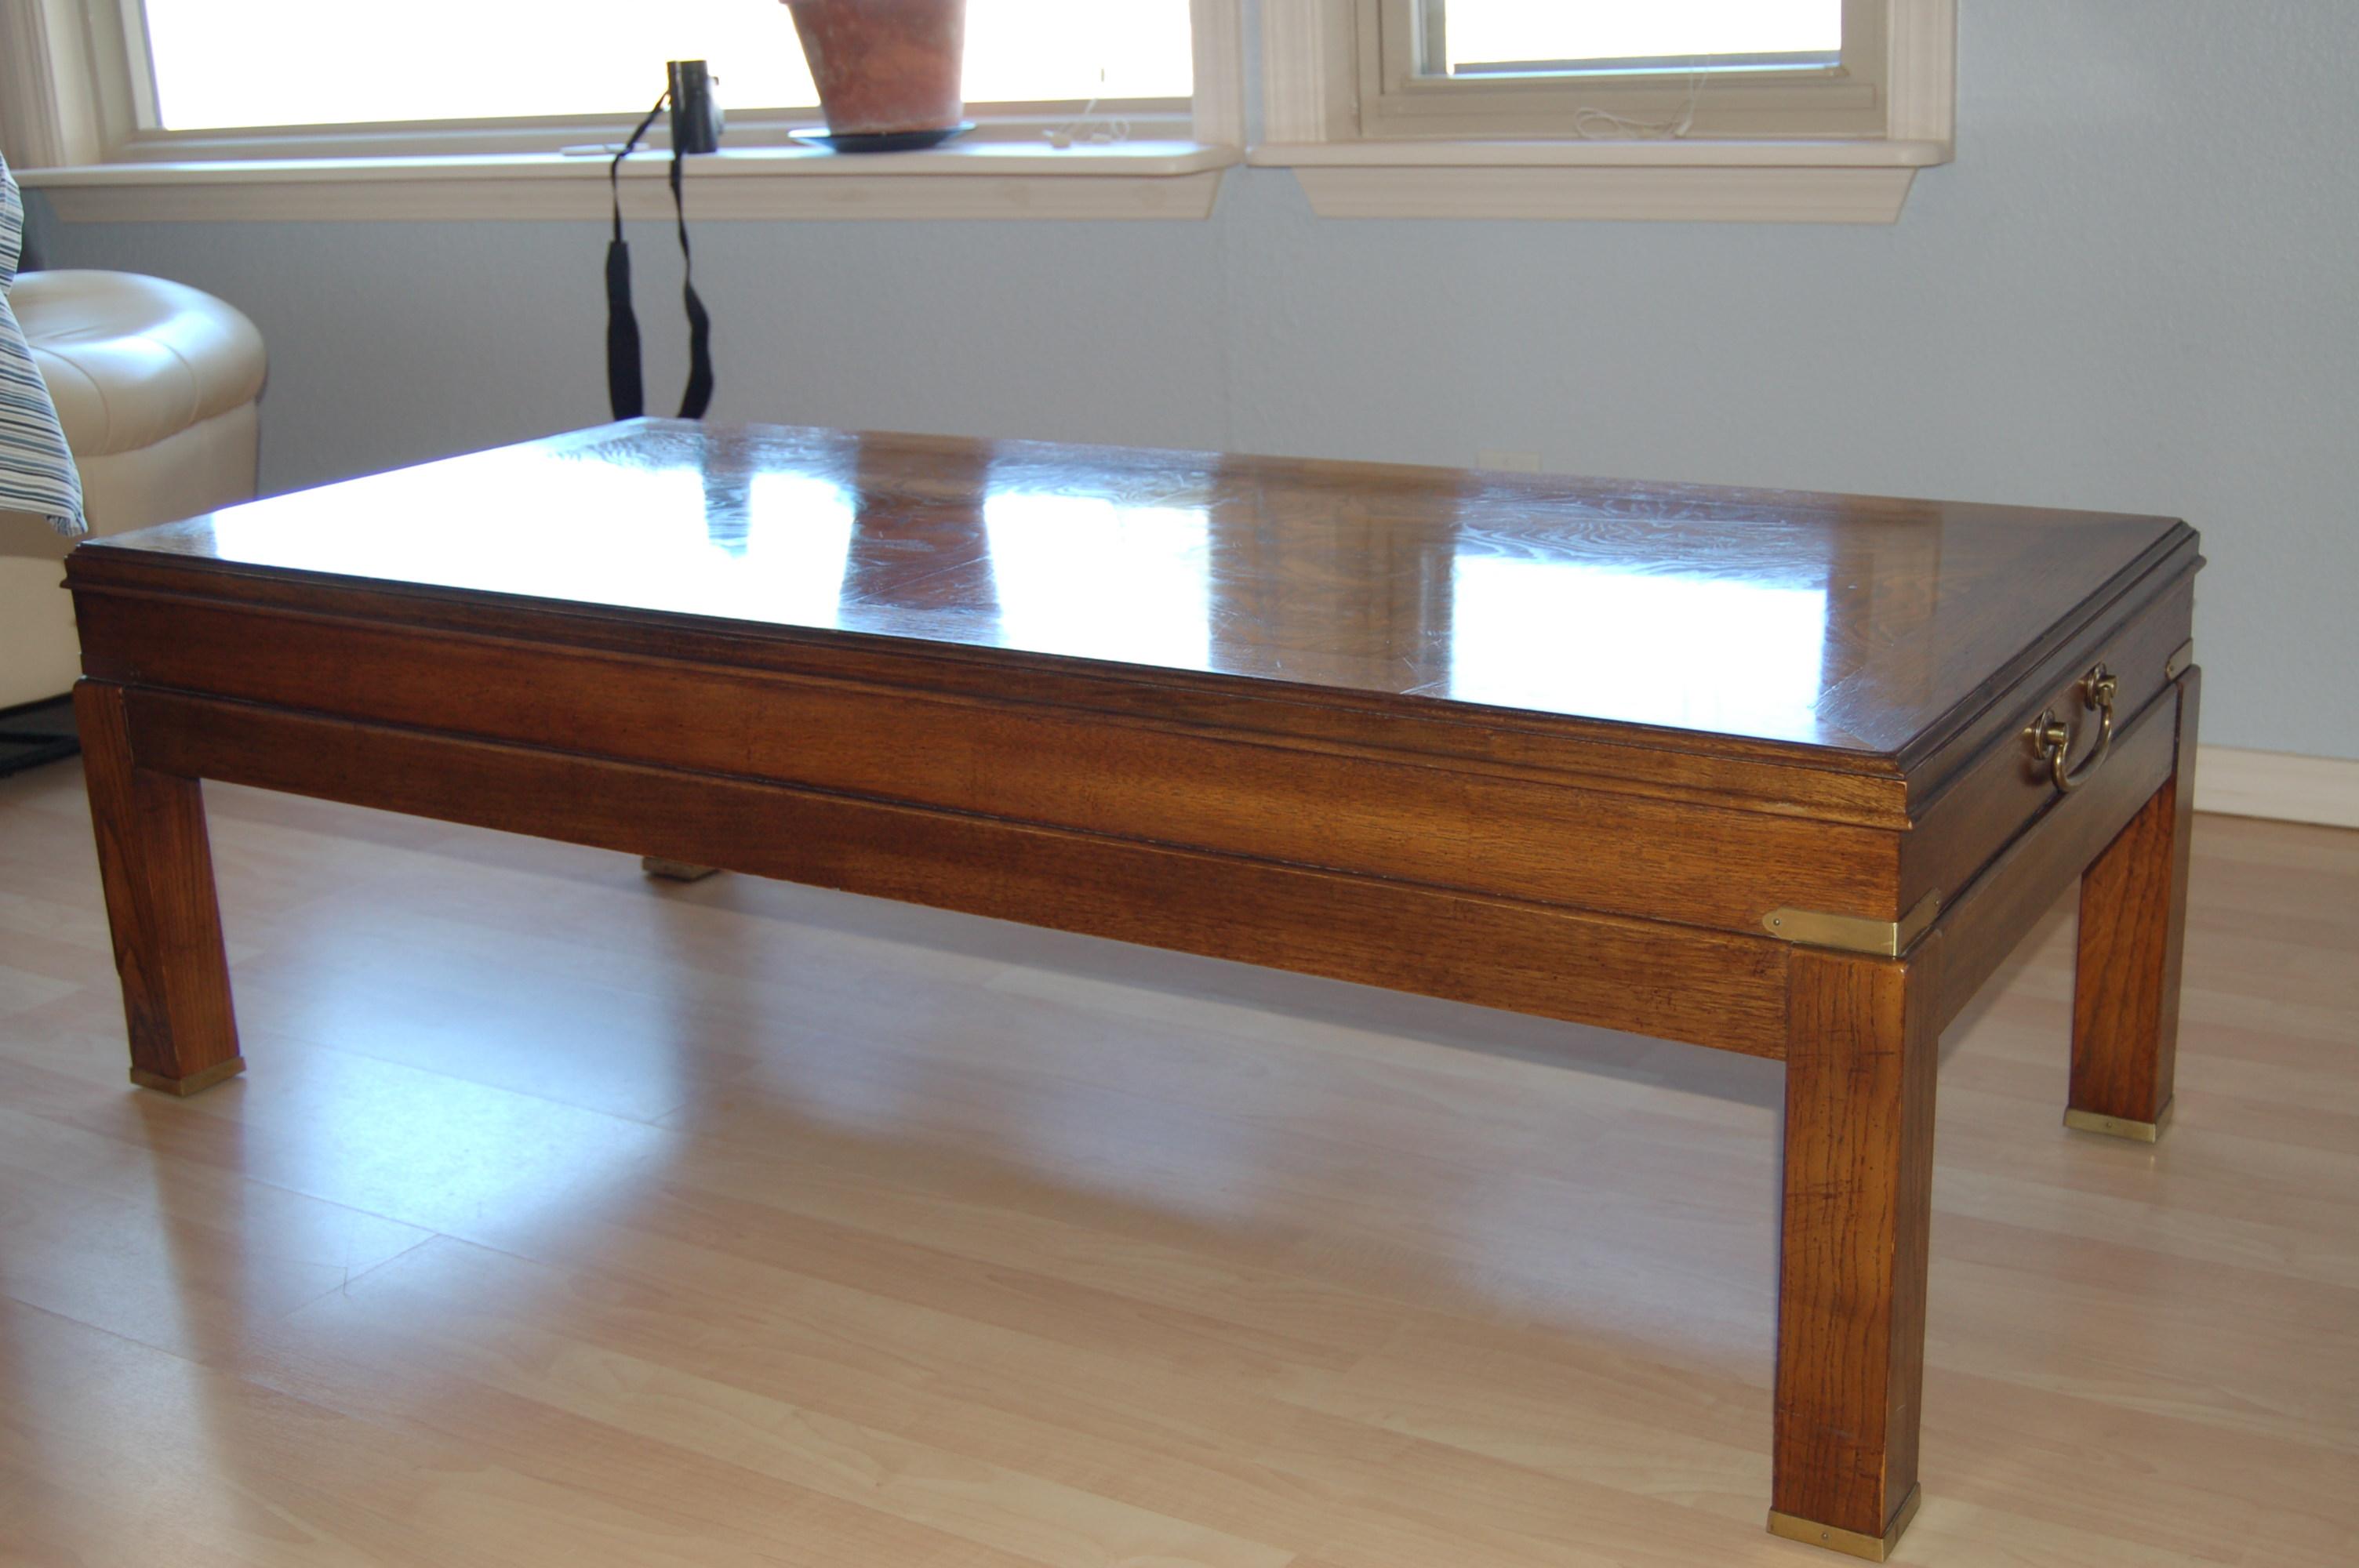 Swell Lane Altavista Va Coffee Table Antique Appraisal Instappraisal Beatyapartments Chair Design Images Beatyapartmentscom